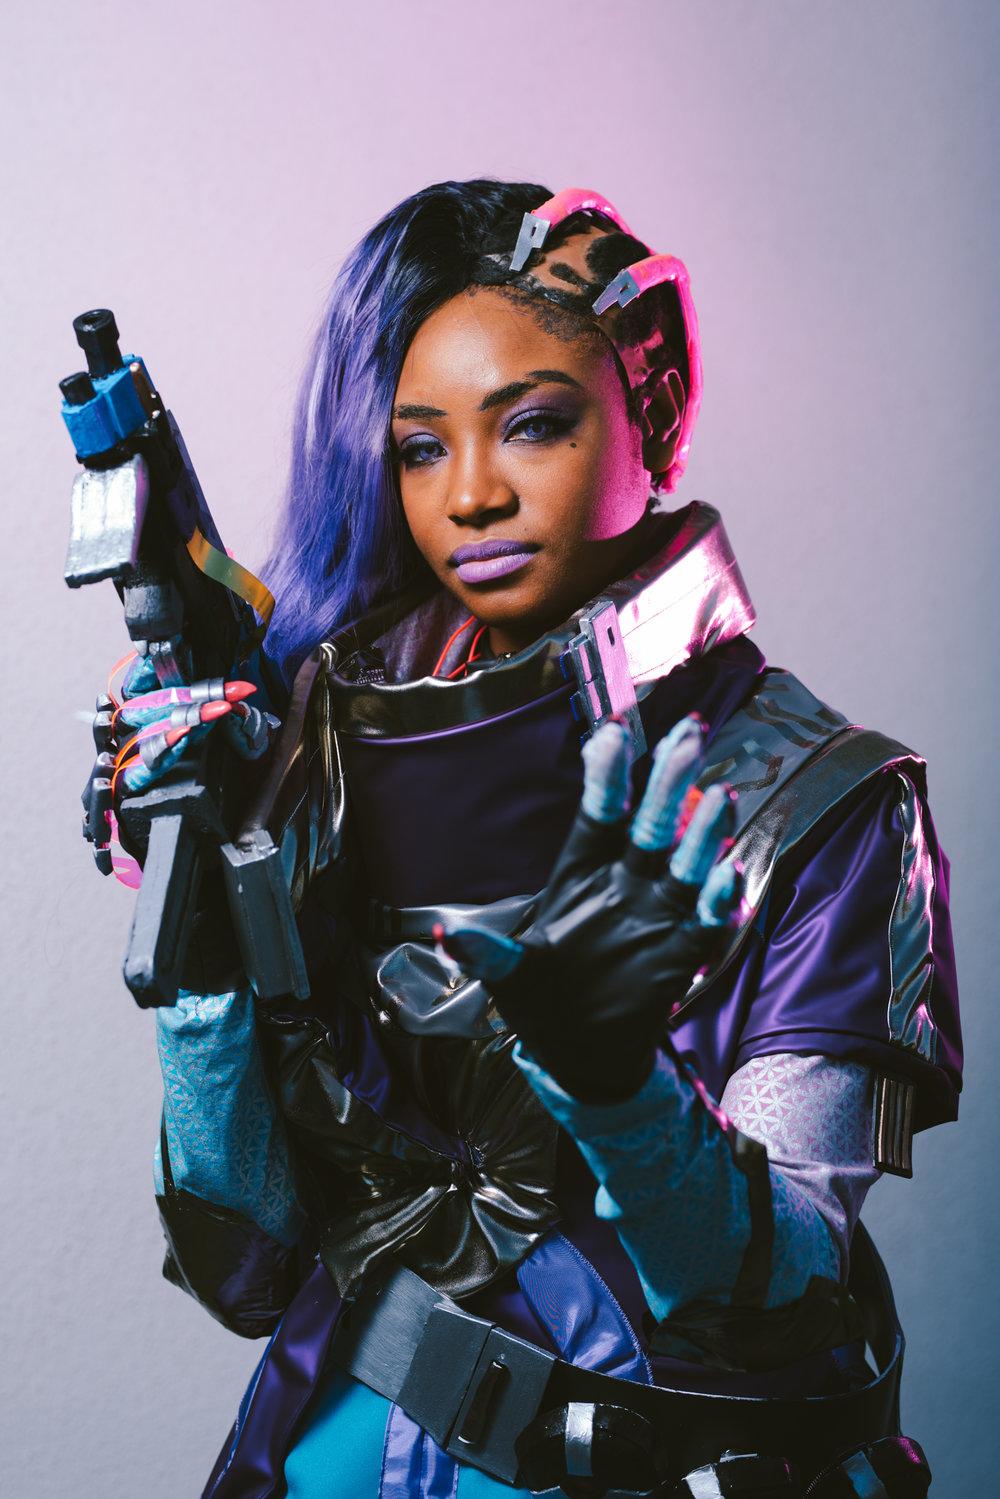 cosplay_ow04.jpg